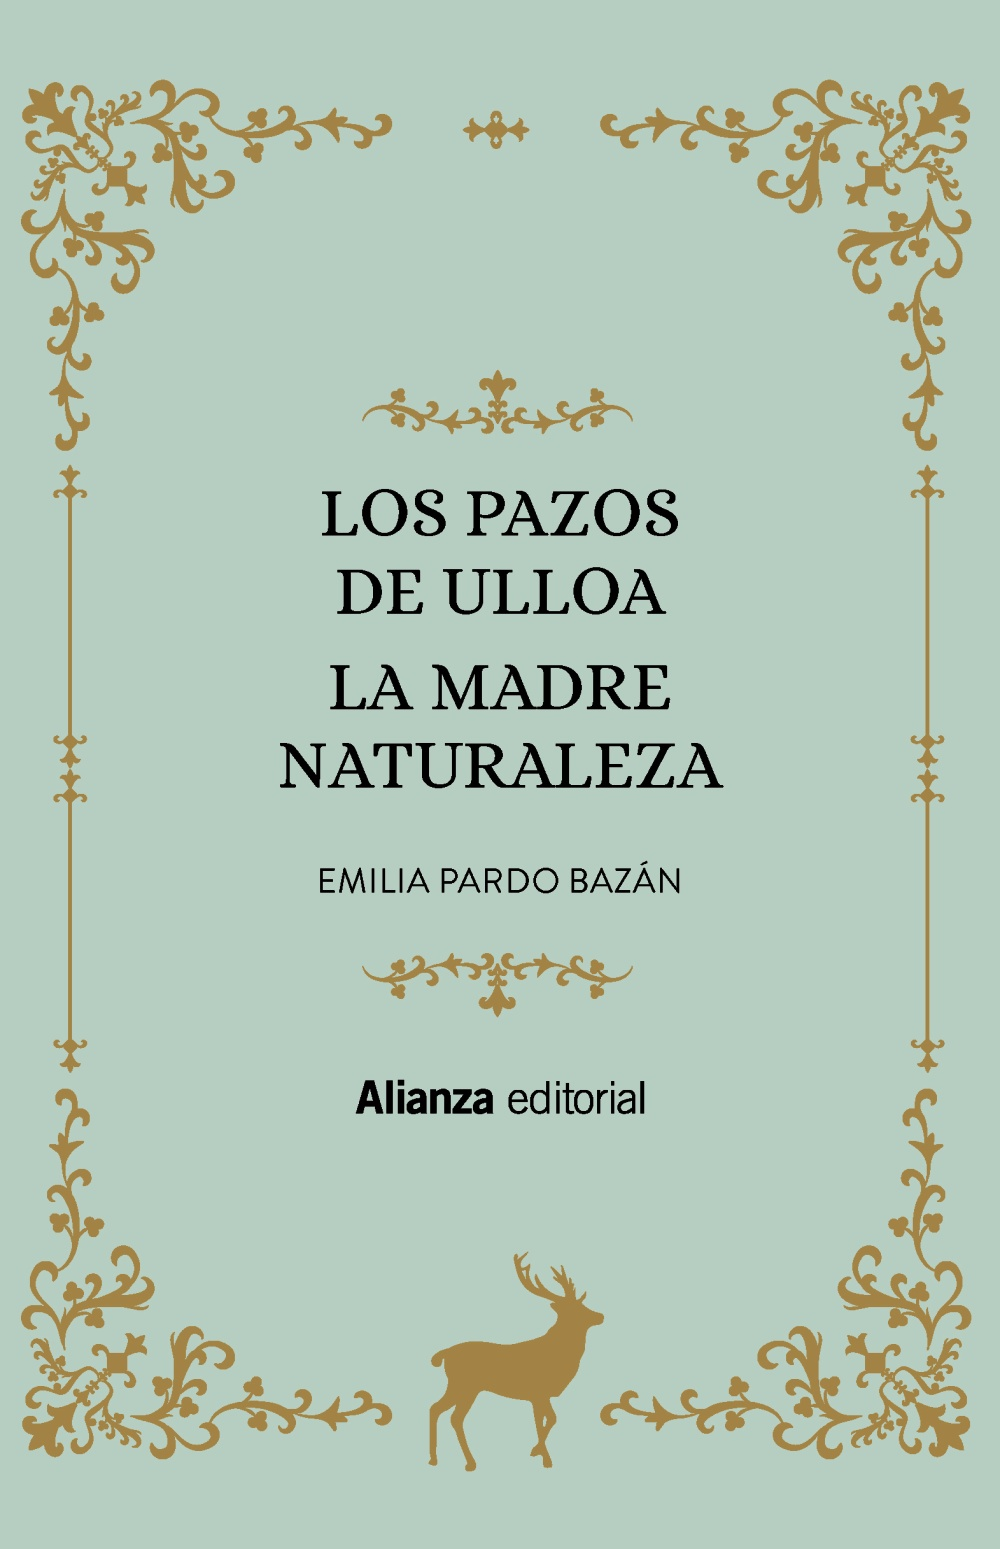 9788413620947-los-pazos-de-ulloa-la-madre-naturaleza